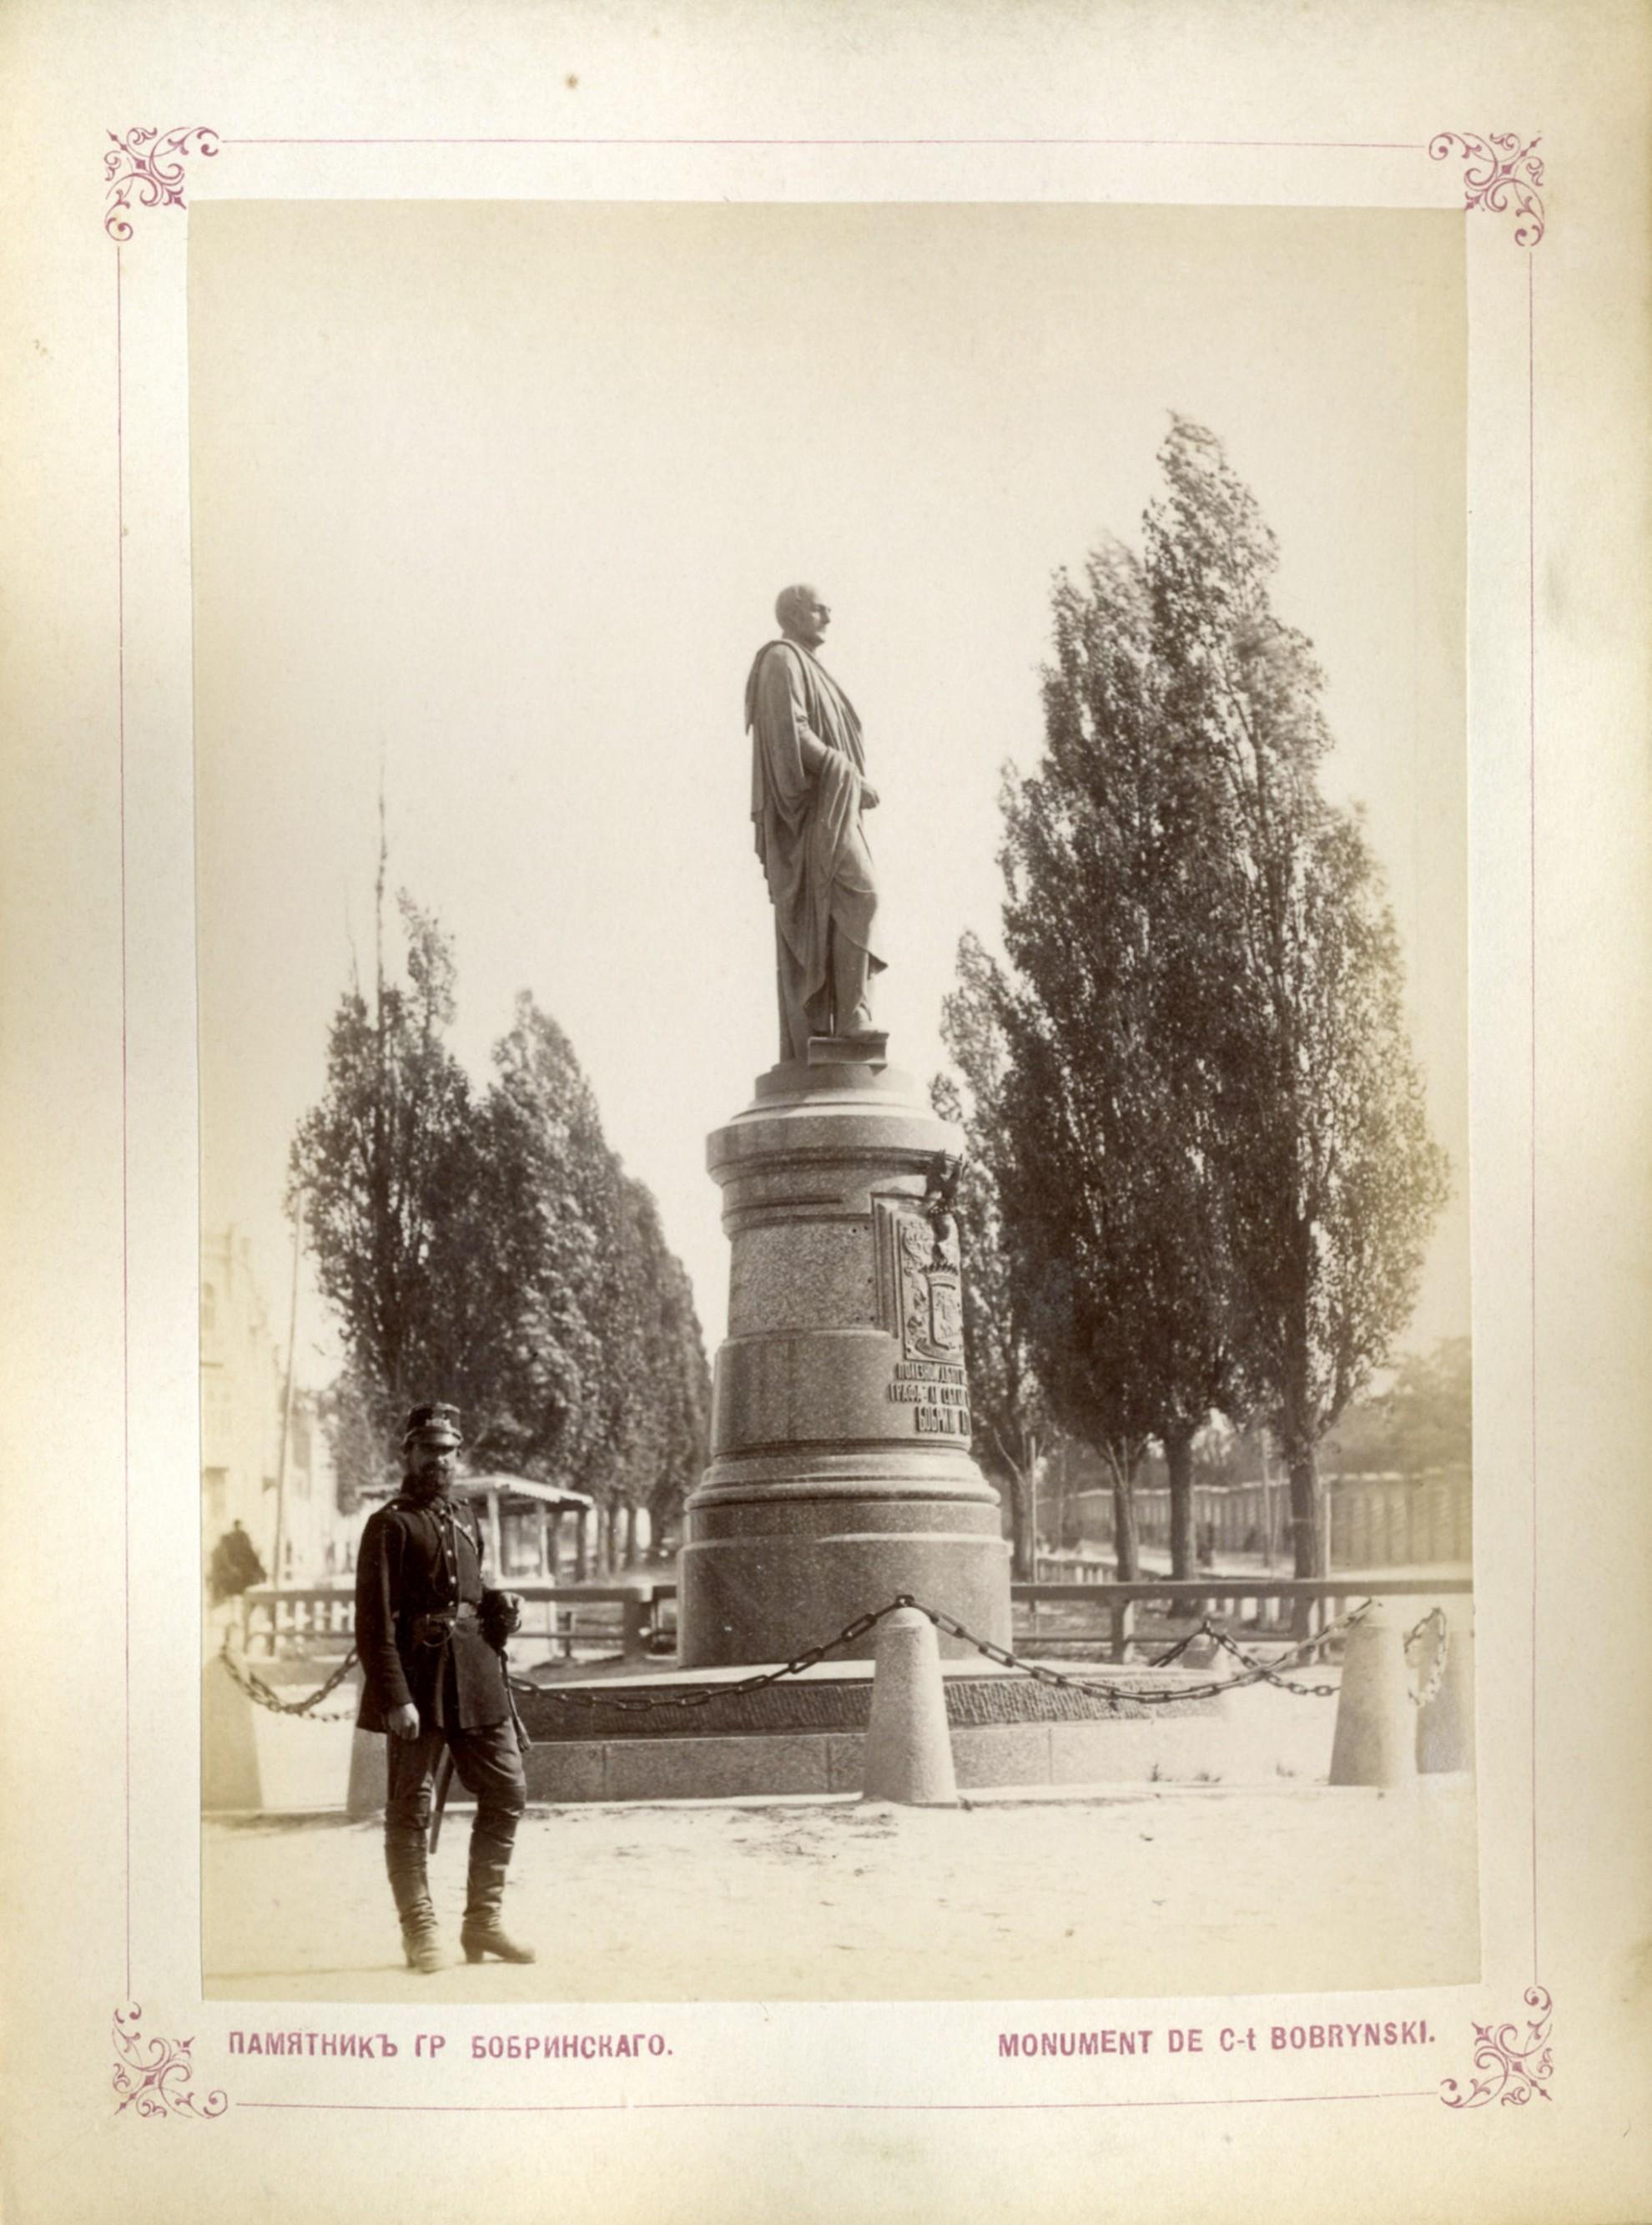 Памятник гр. Бобринского